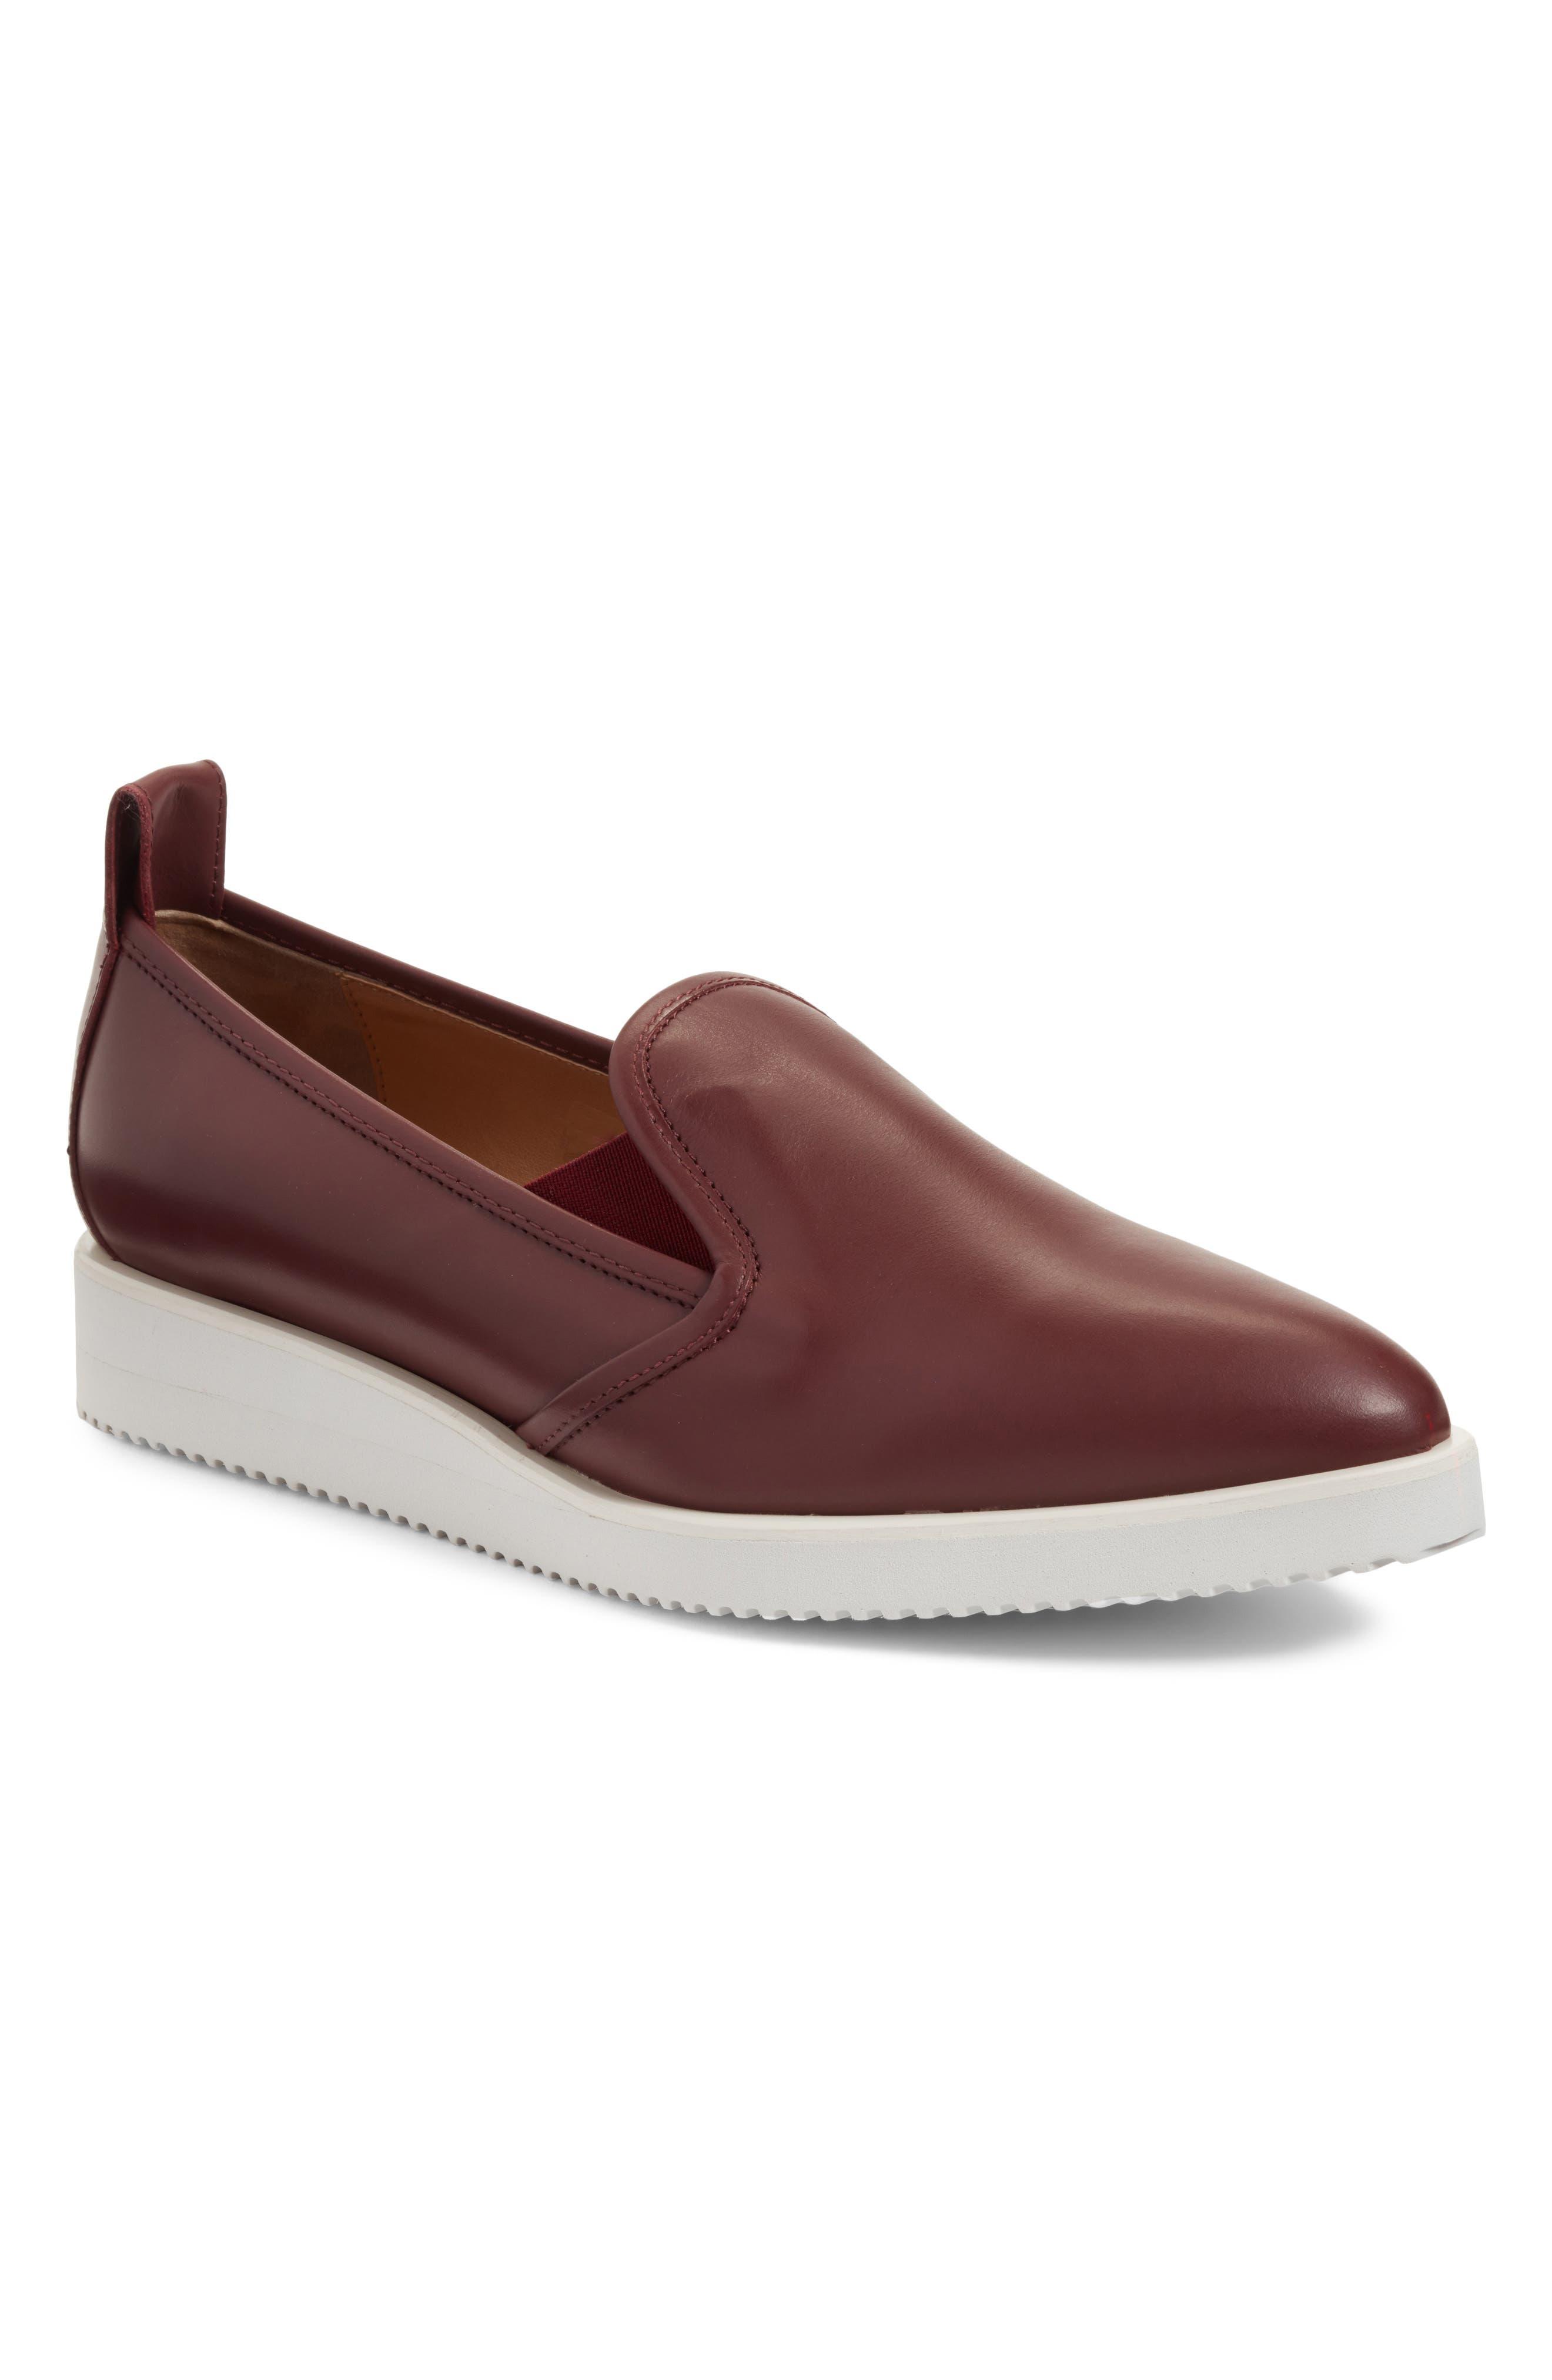 Main Image - Everlane The Leather Street Shoe (Women)